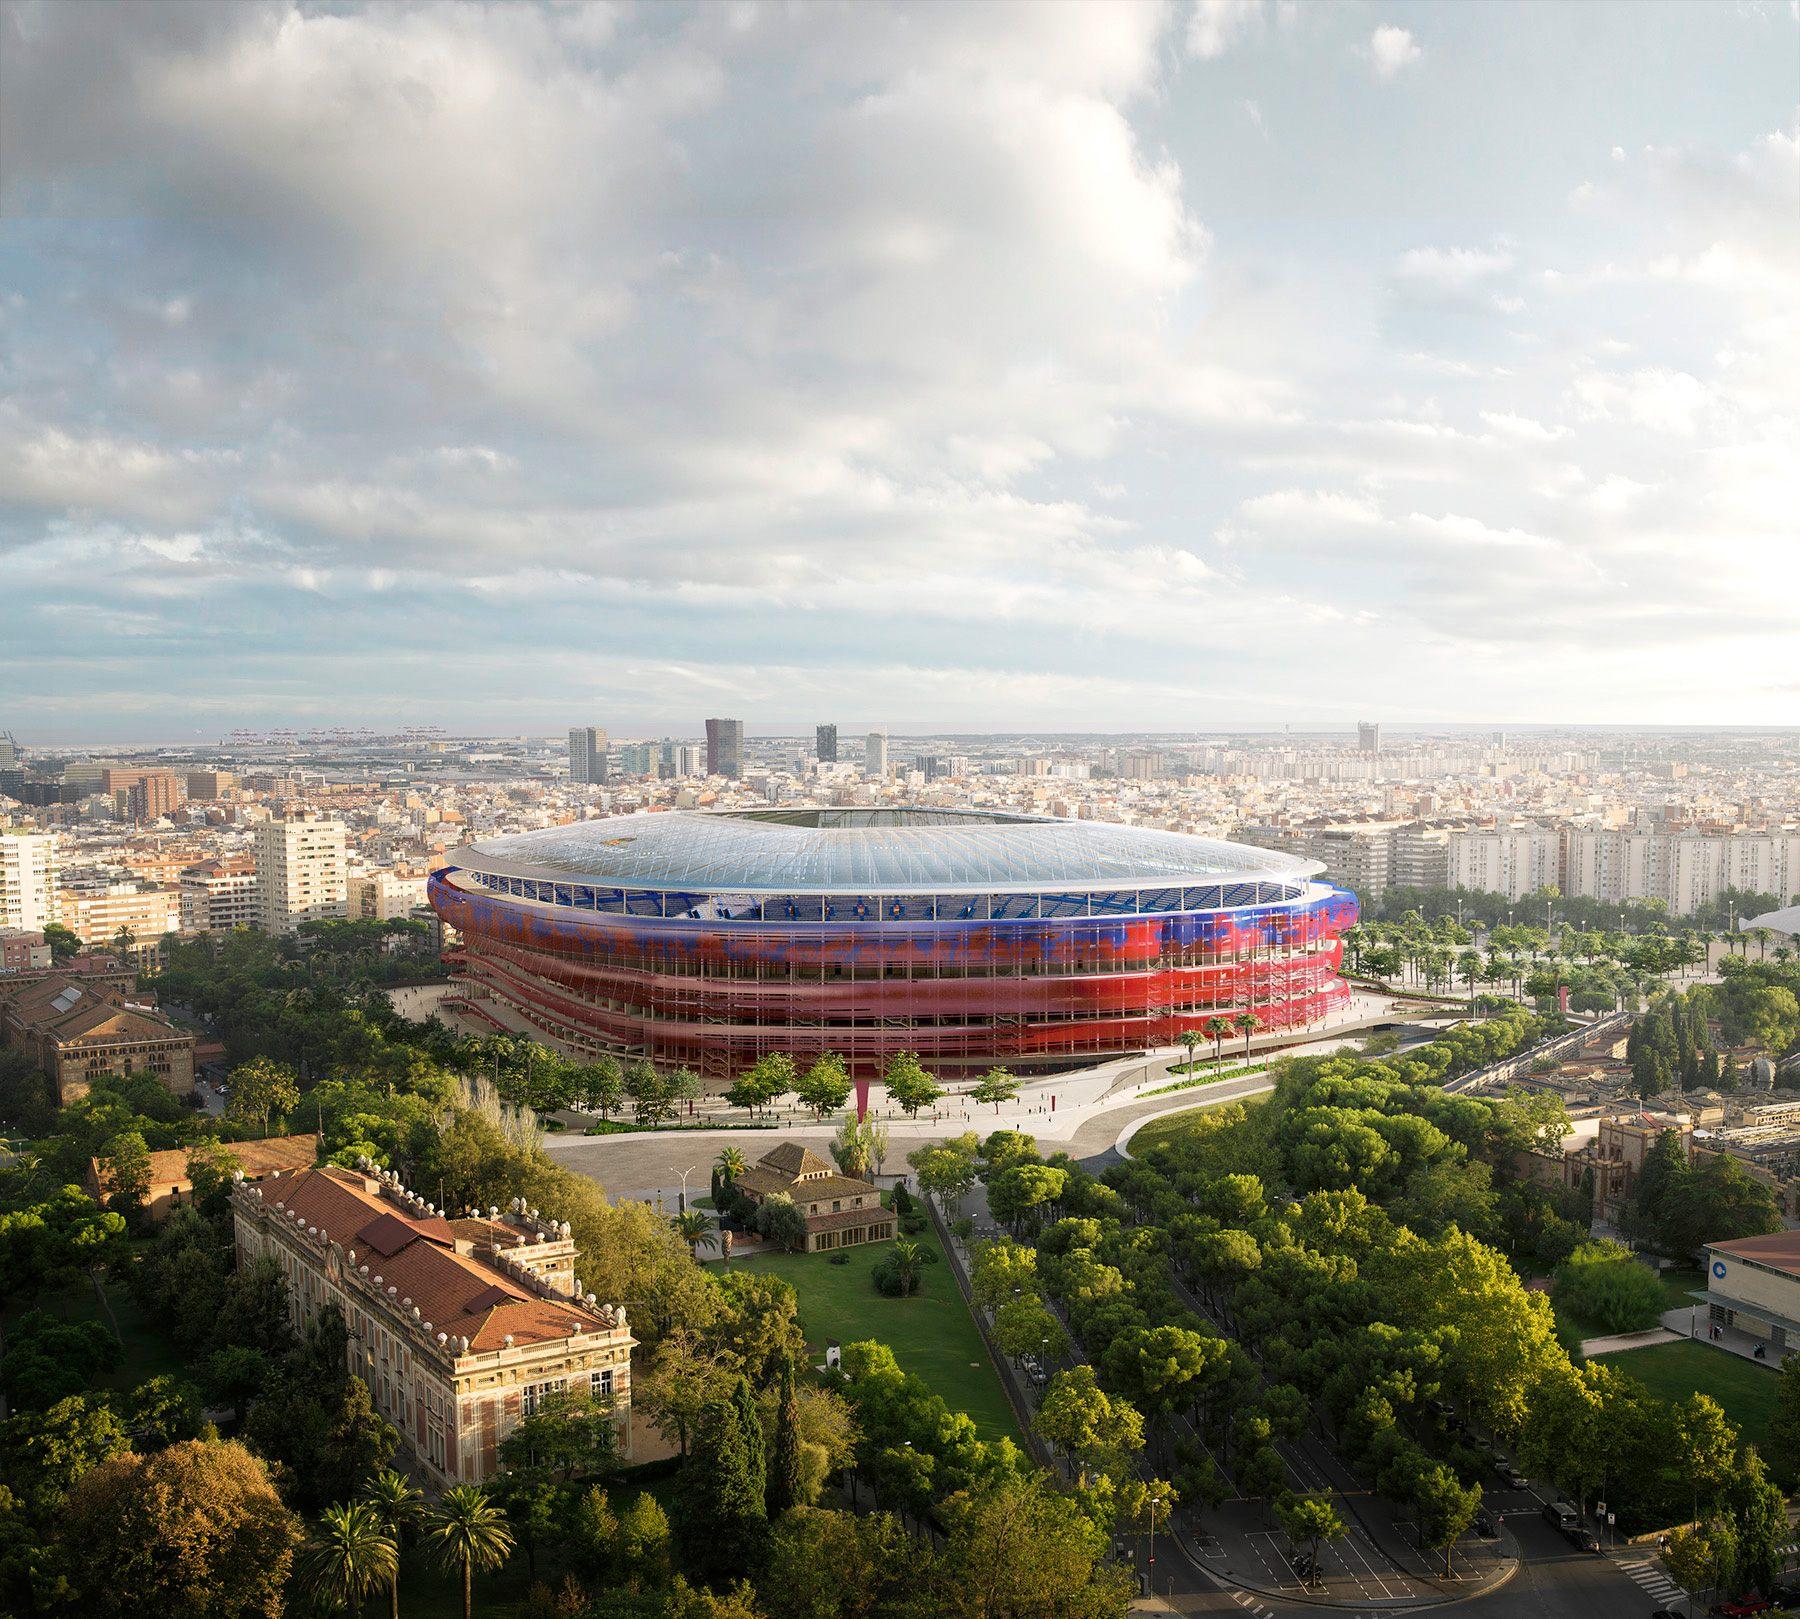 New Camp Nou Design